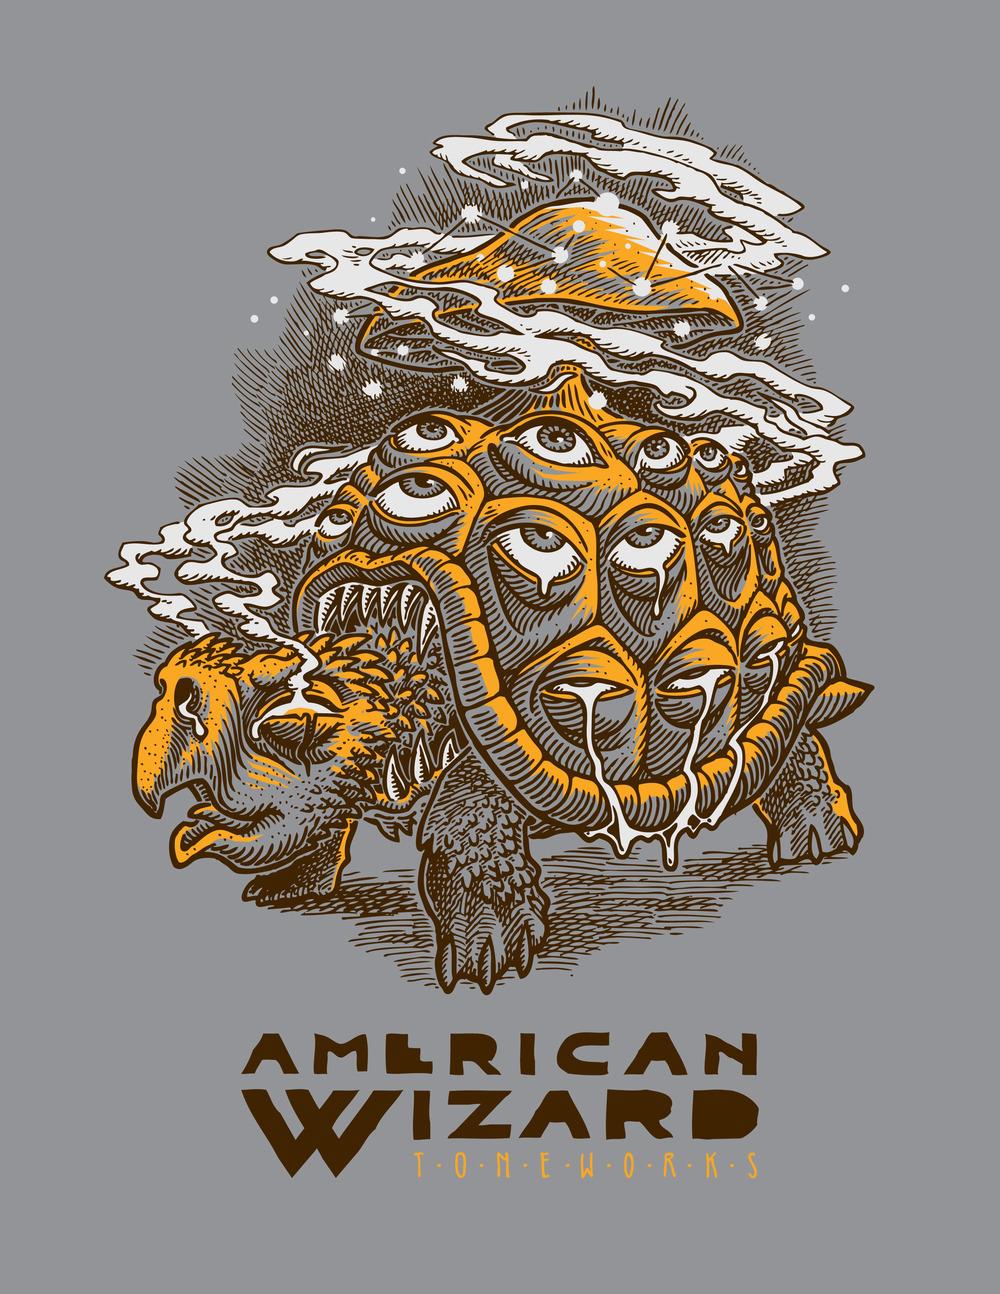 American Wizard Toneworks 1.jpg